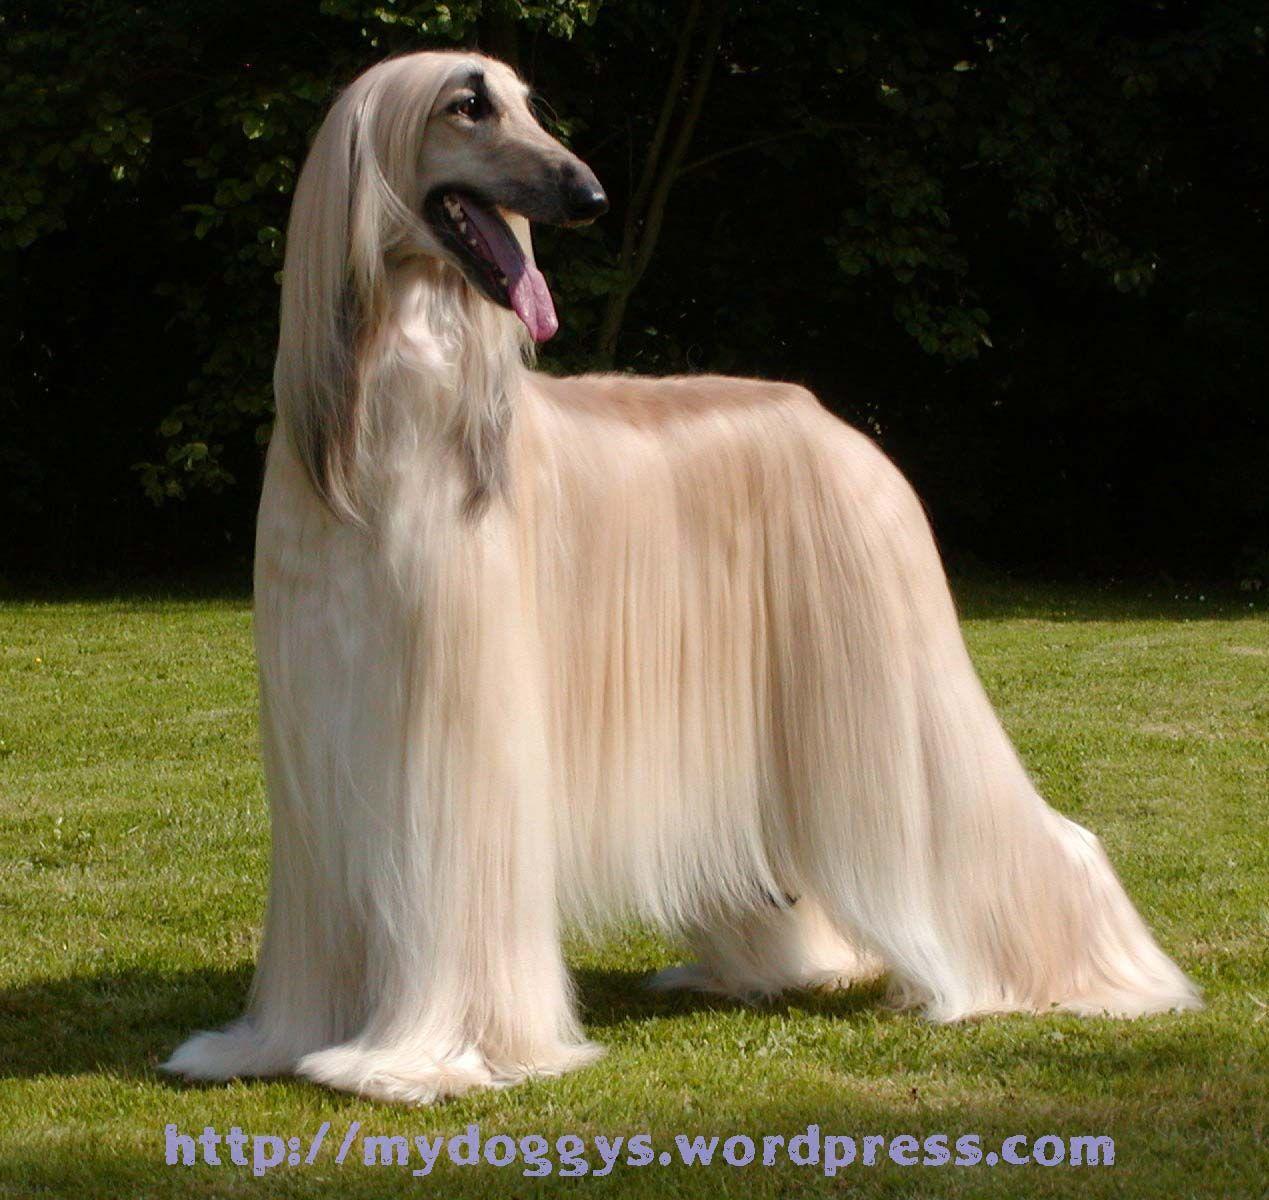 Pet Dog Beauty Afghan Hound Hound Dog Breeds Afghan Hound